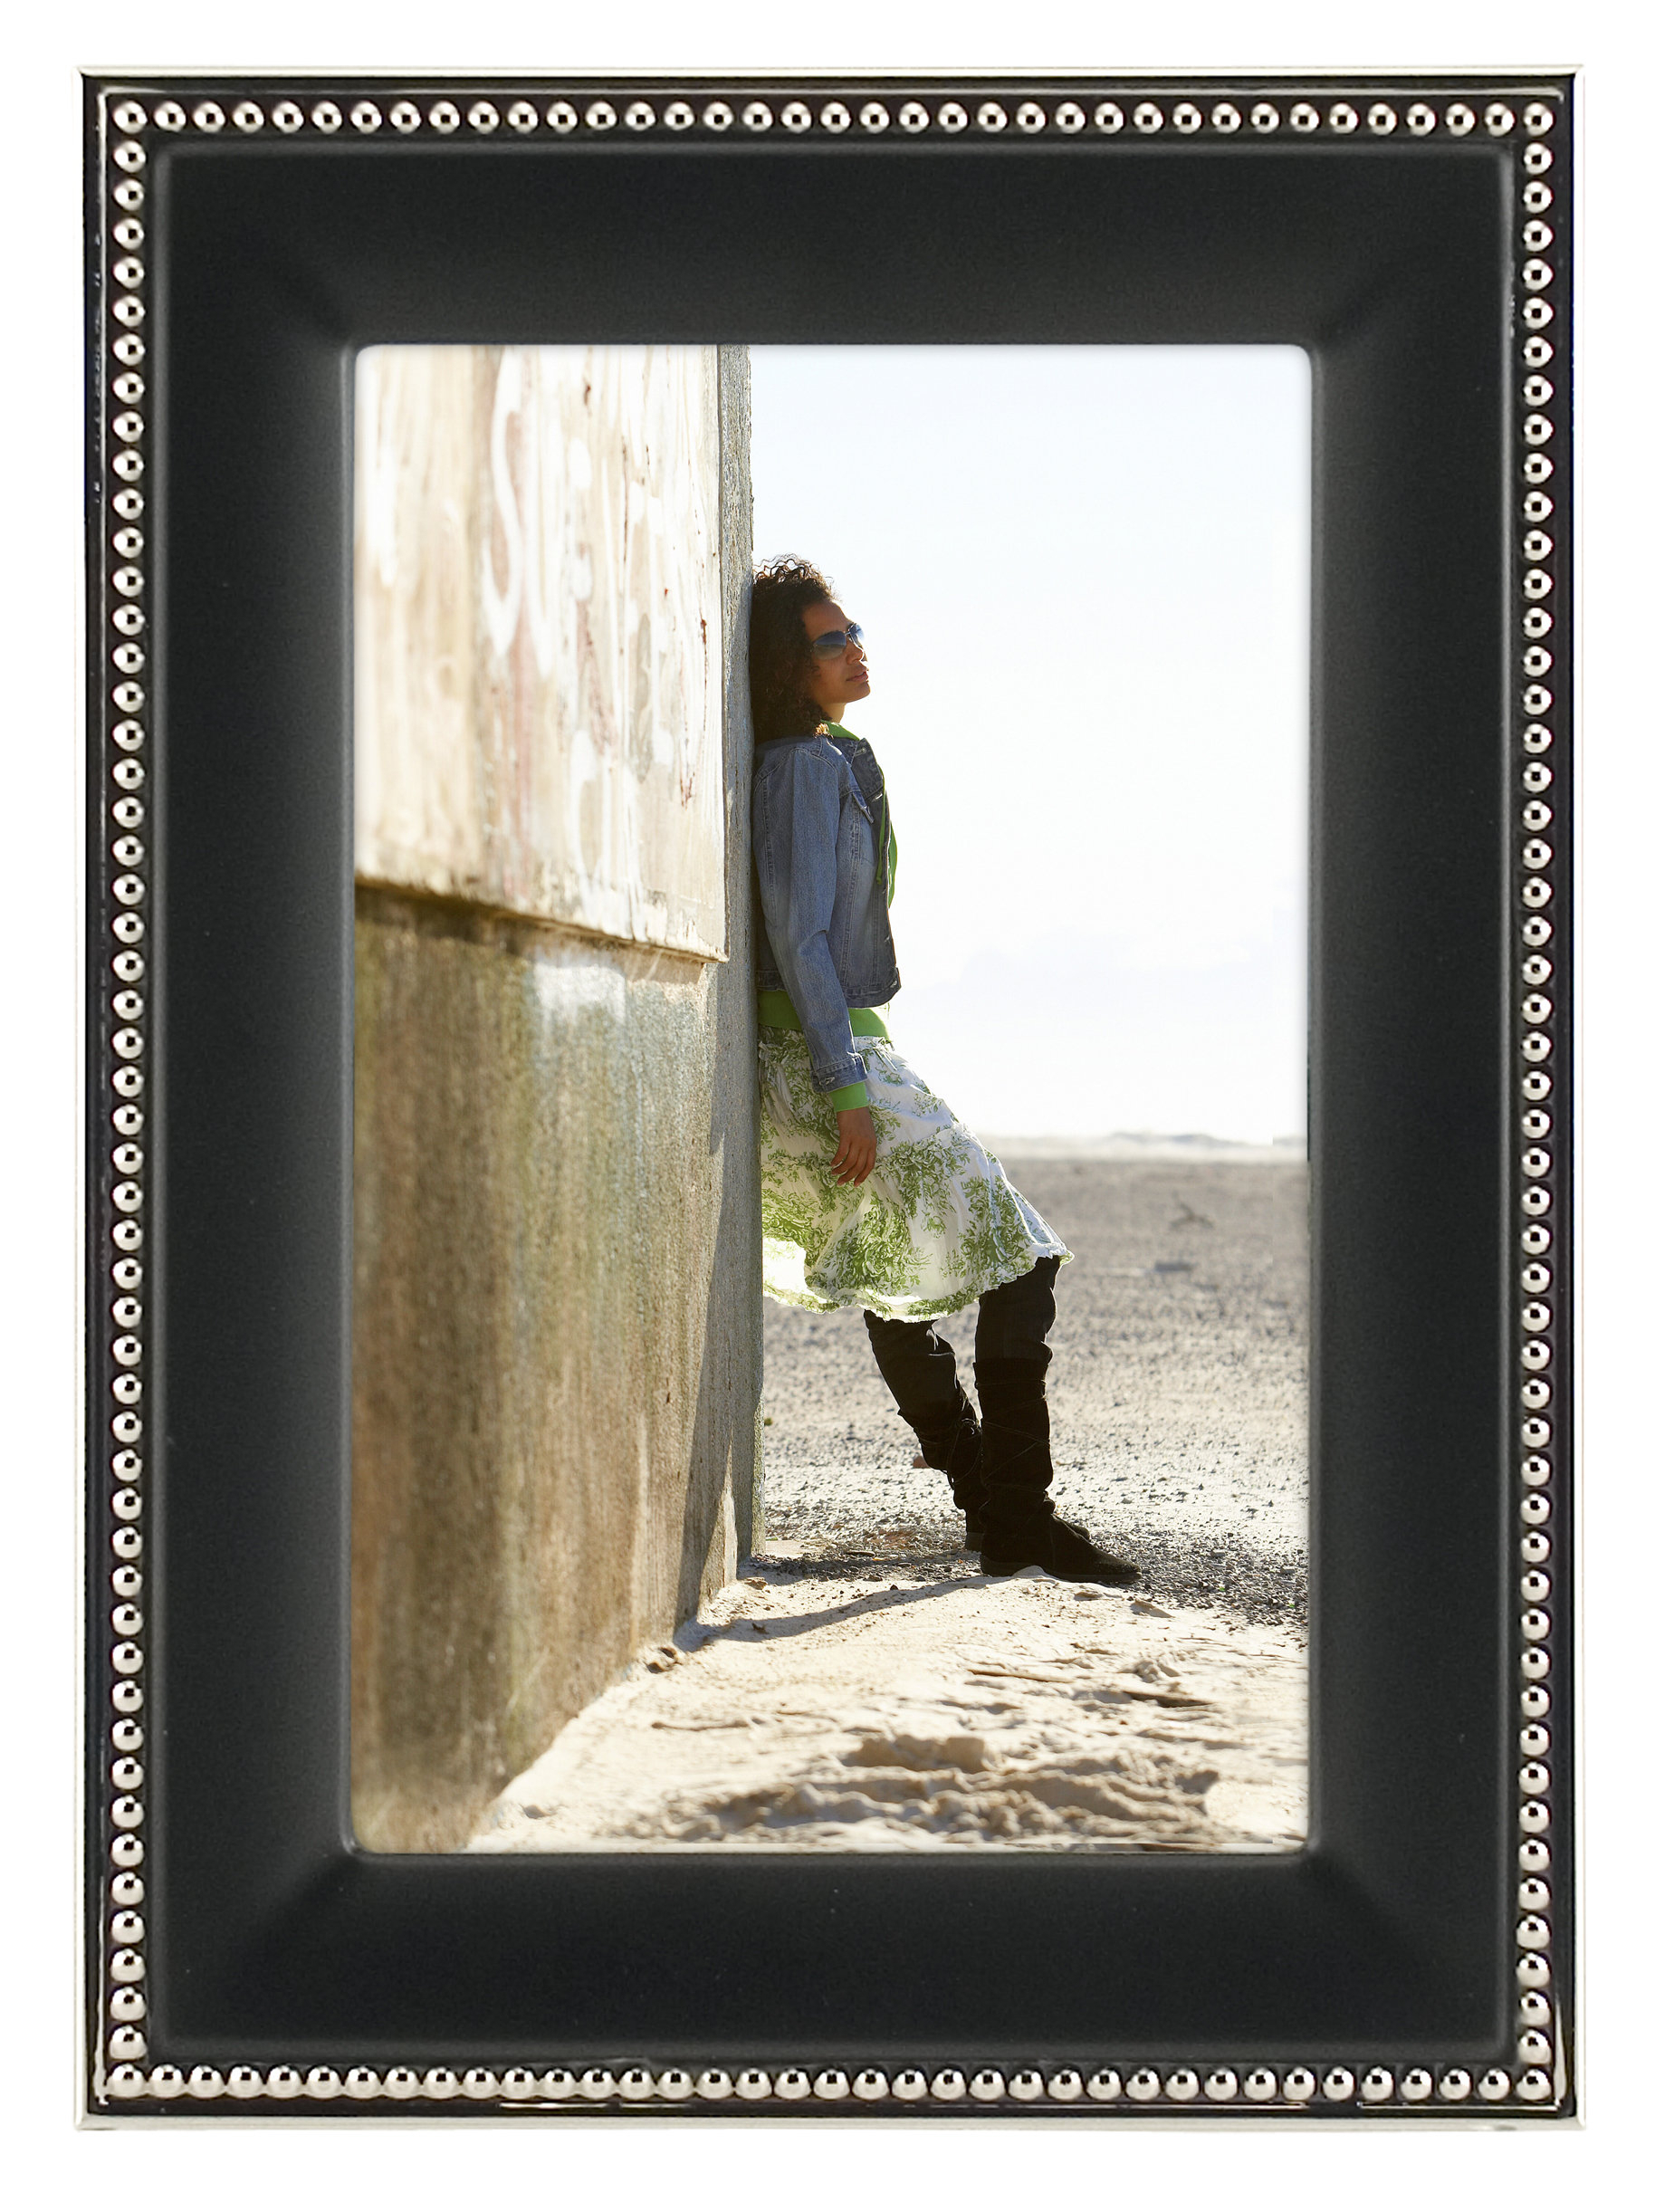 Black Picture Frames | Joss & Main pertaining to Millanocket Metal Wheel Photo Holder Wall Decor (Image 4 of 30)